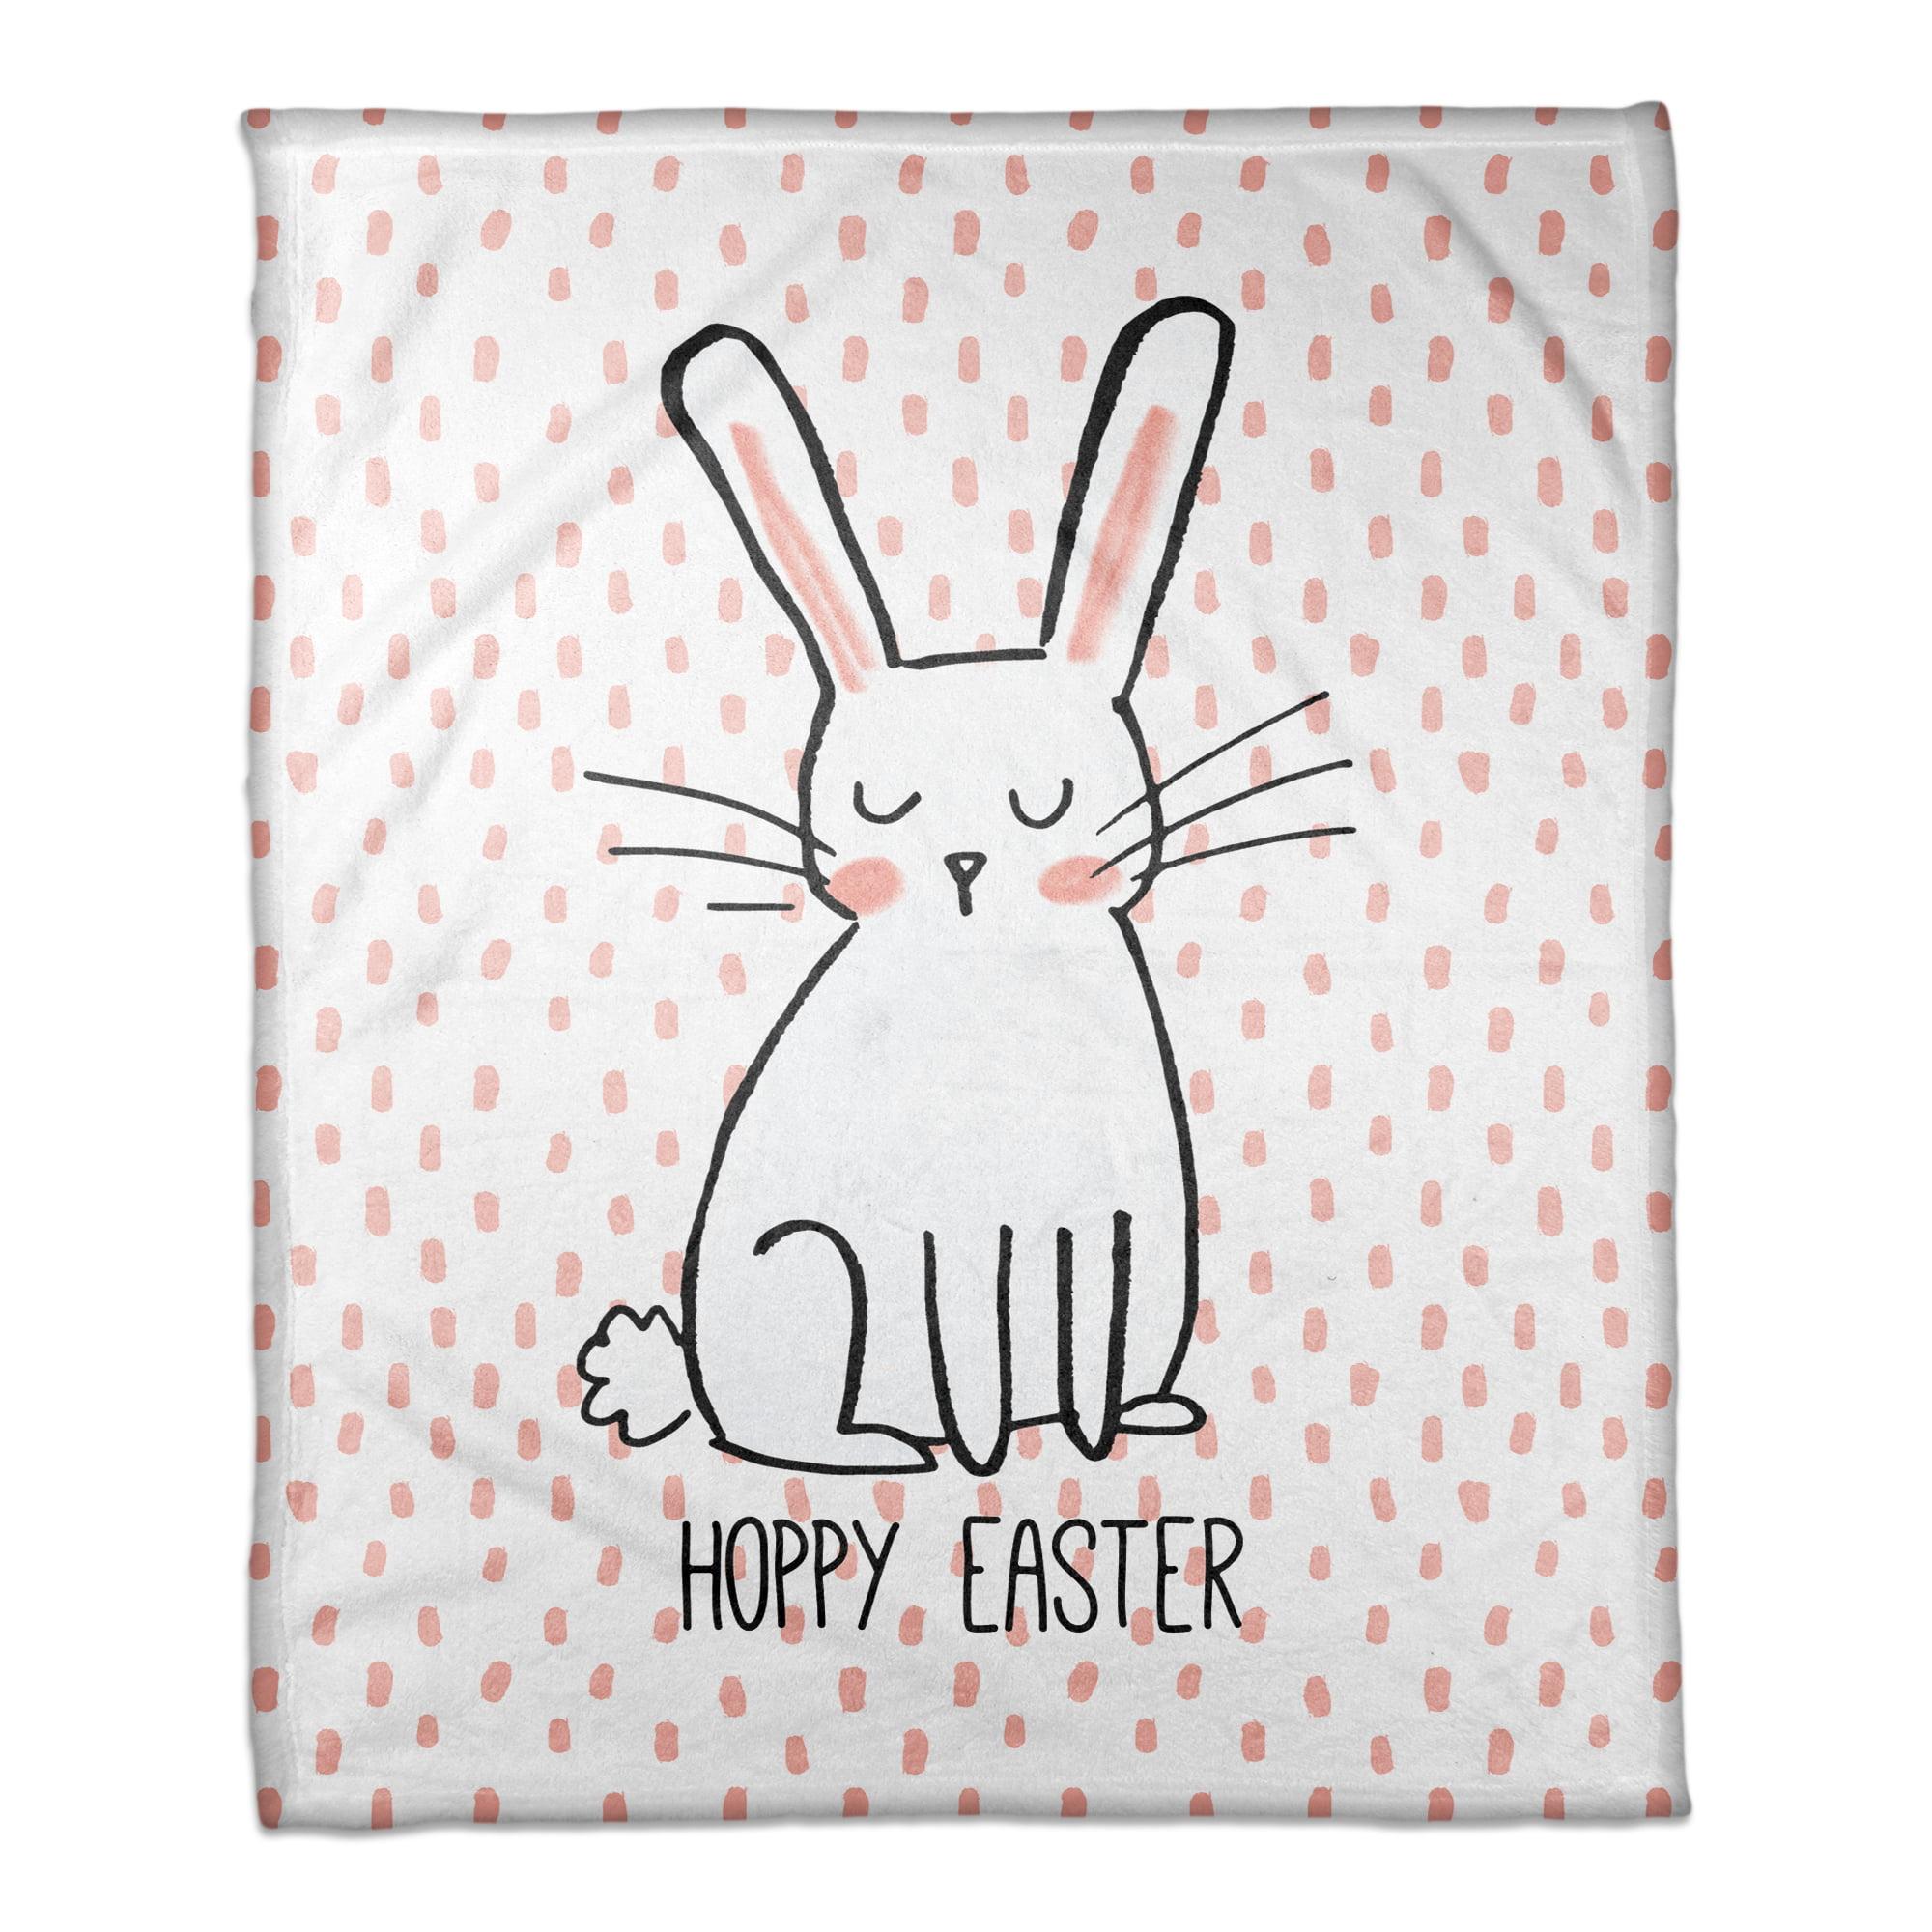 Hoppy Easter 30x40 Coral Fleece Blanket